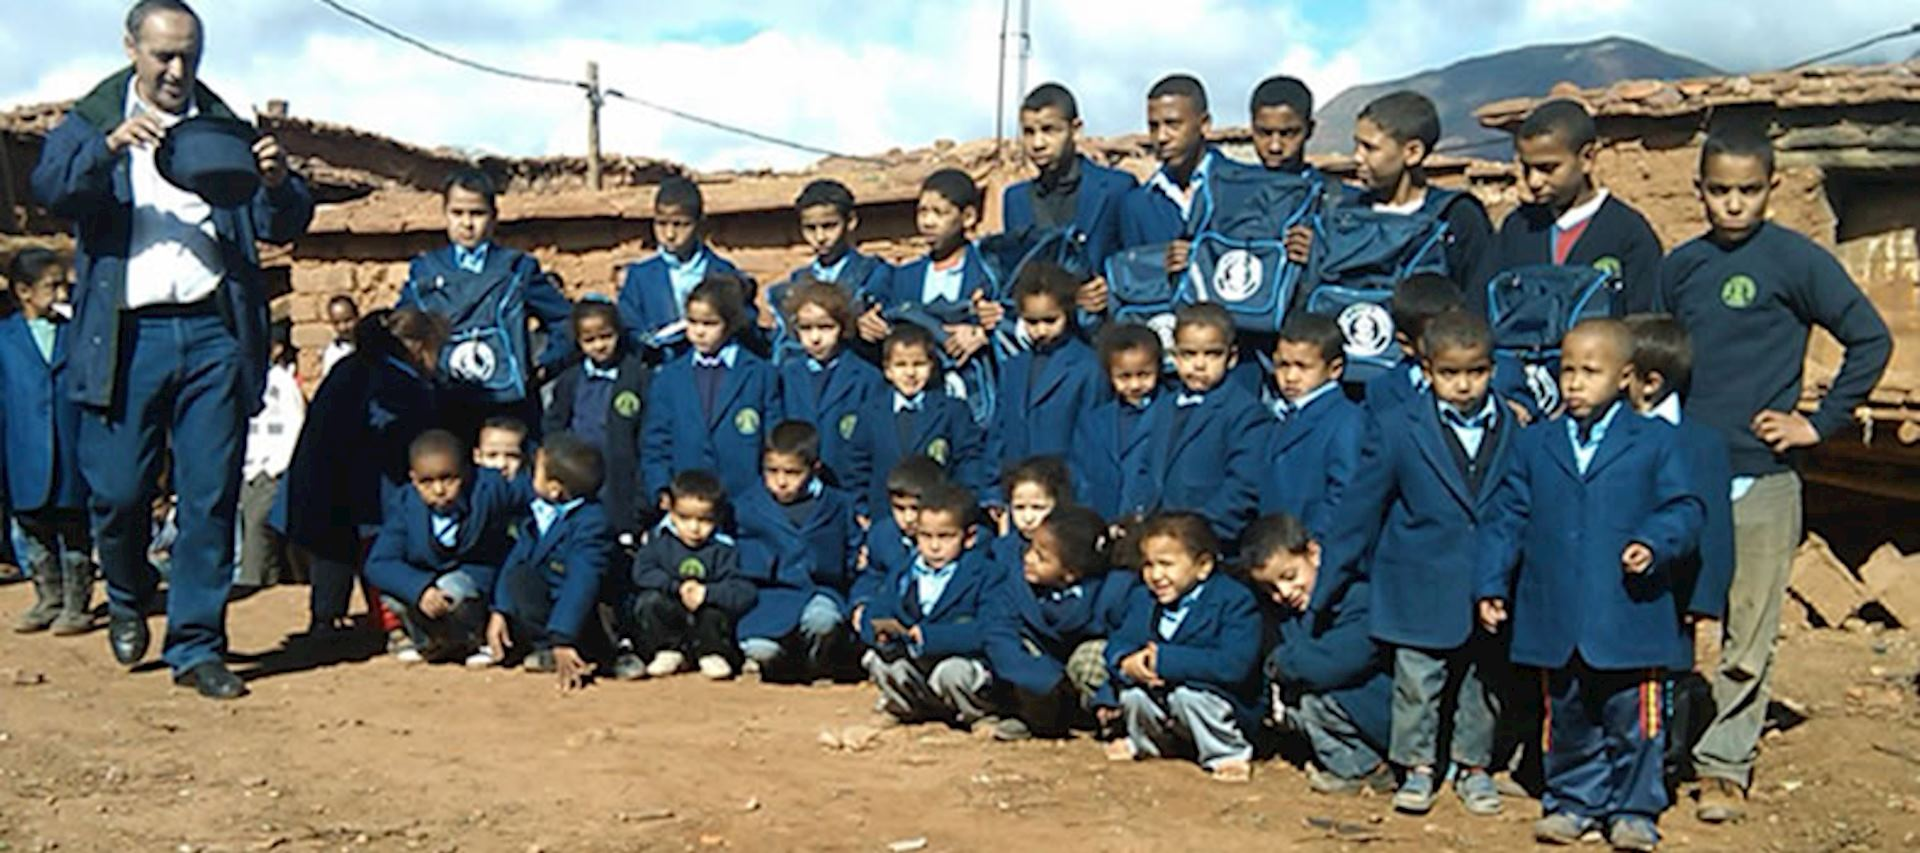 The Assafou Association aims to help both children and women to gain an education